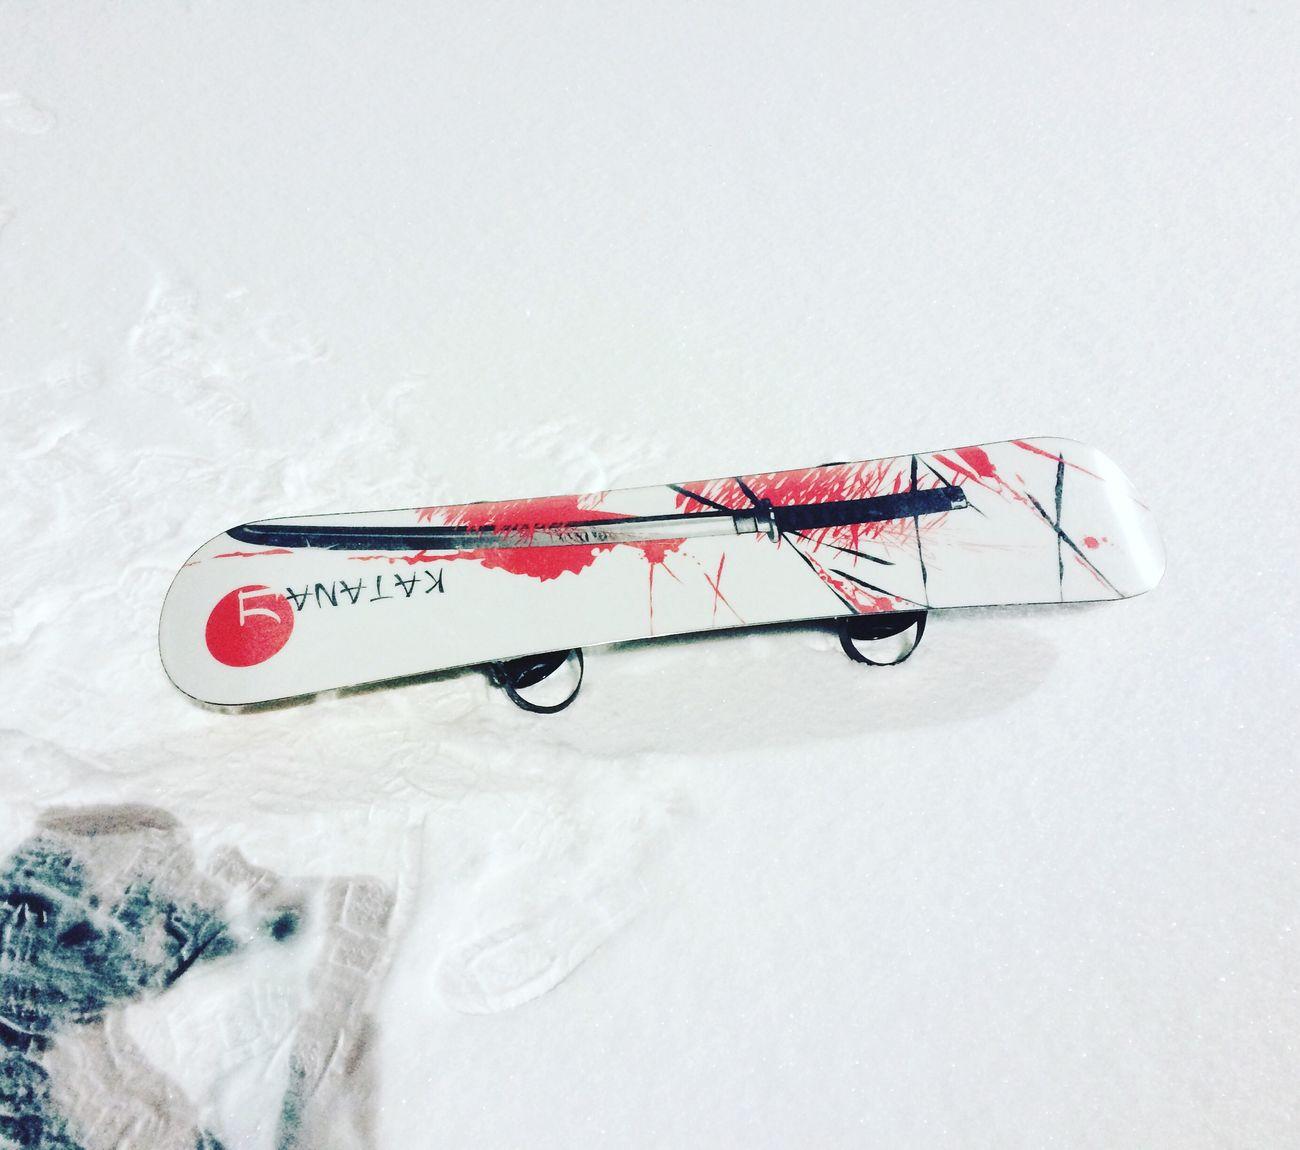 Snow Winter Snowboarding Snowboard зима Сноубординг сноуборд